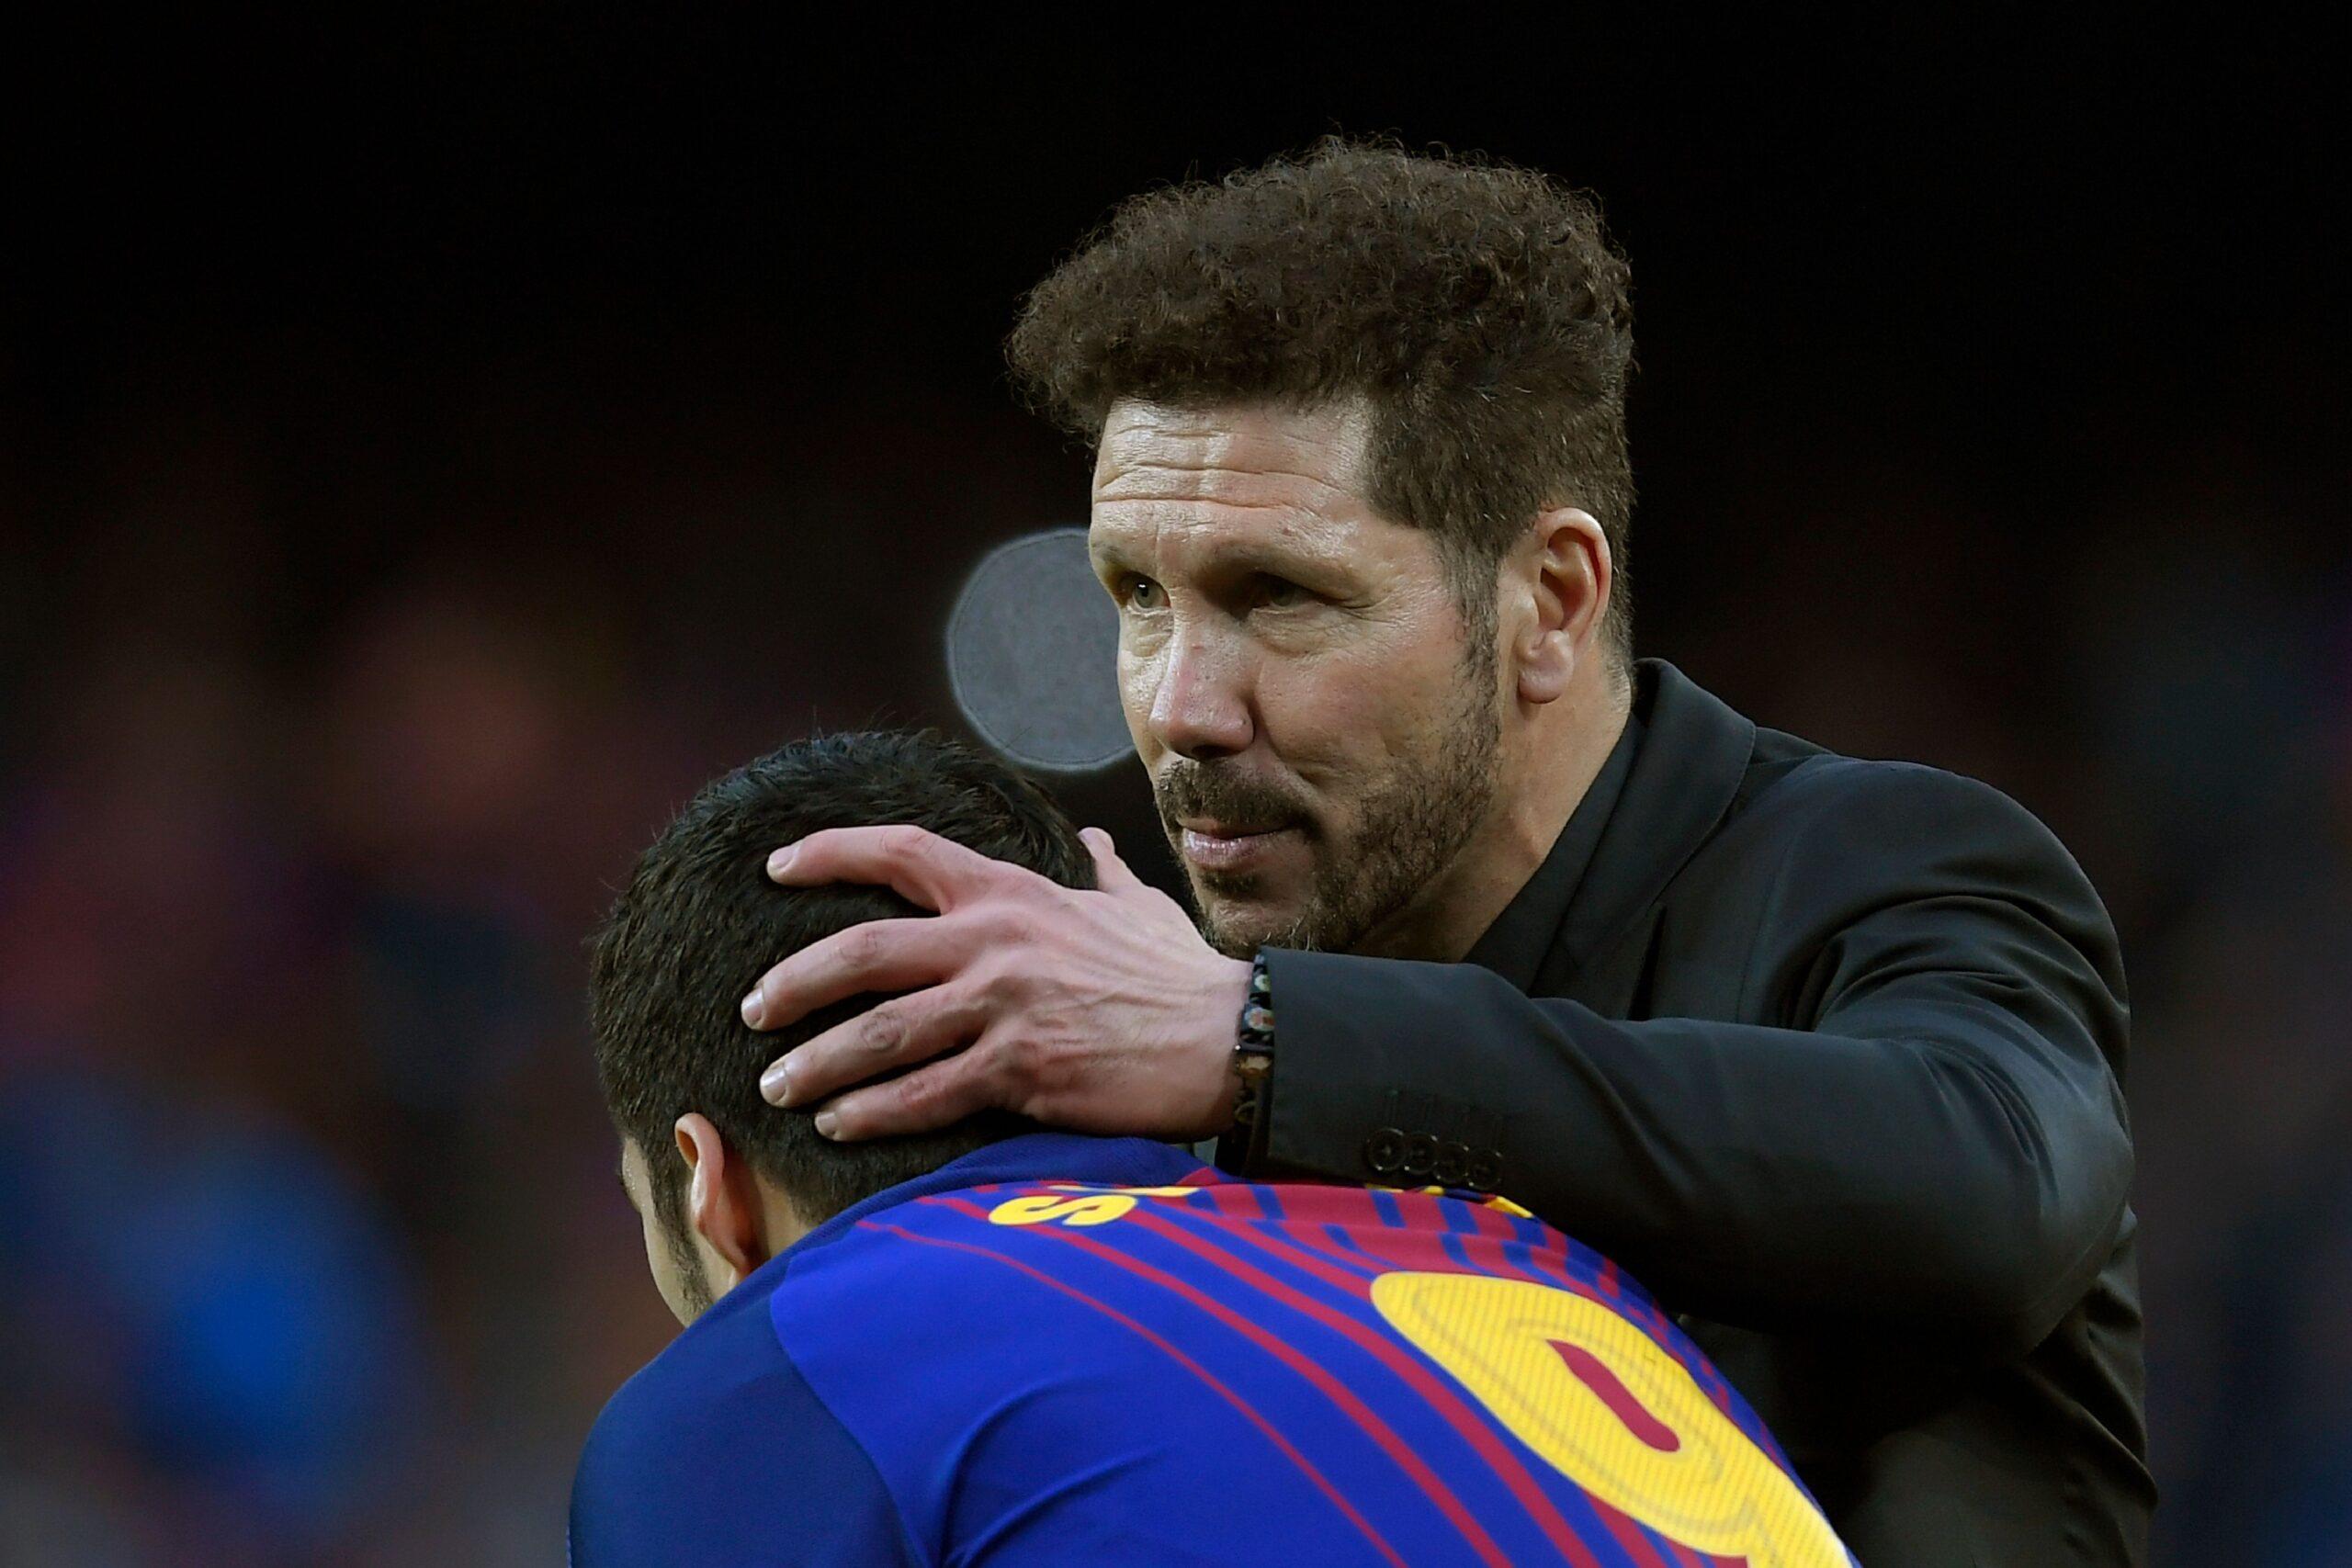 VIDEO: Desvelan qué le dijo Simeone a Suárez para convencerlo